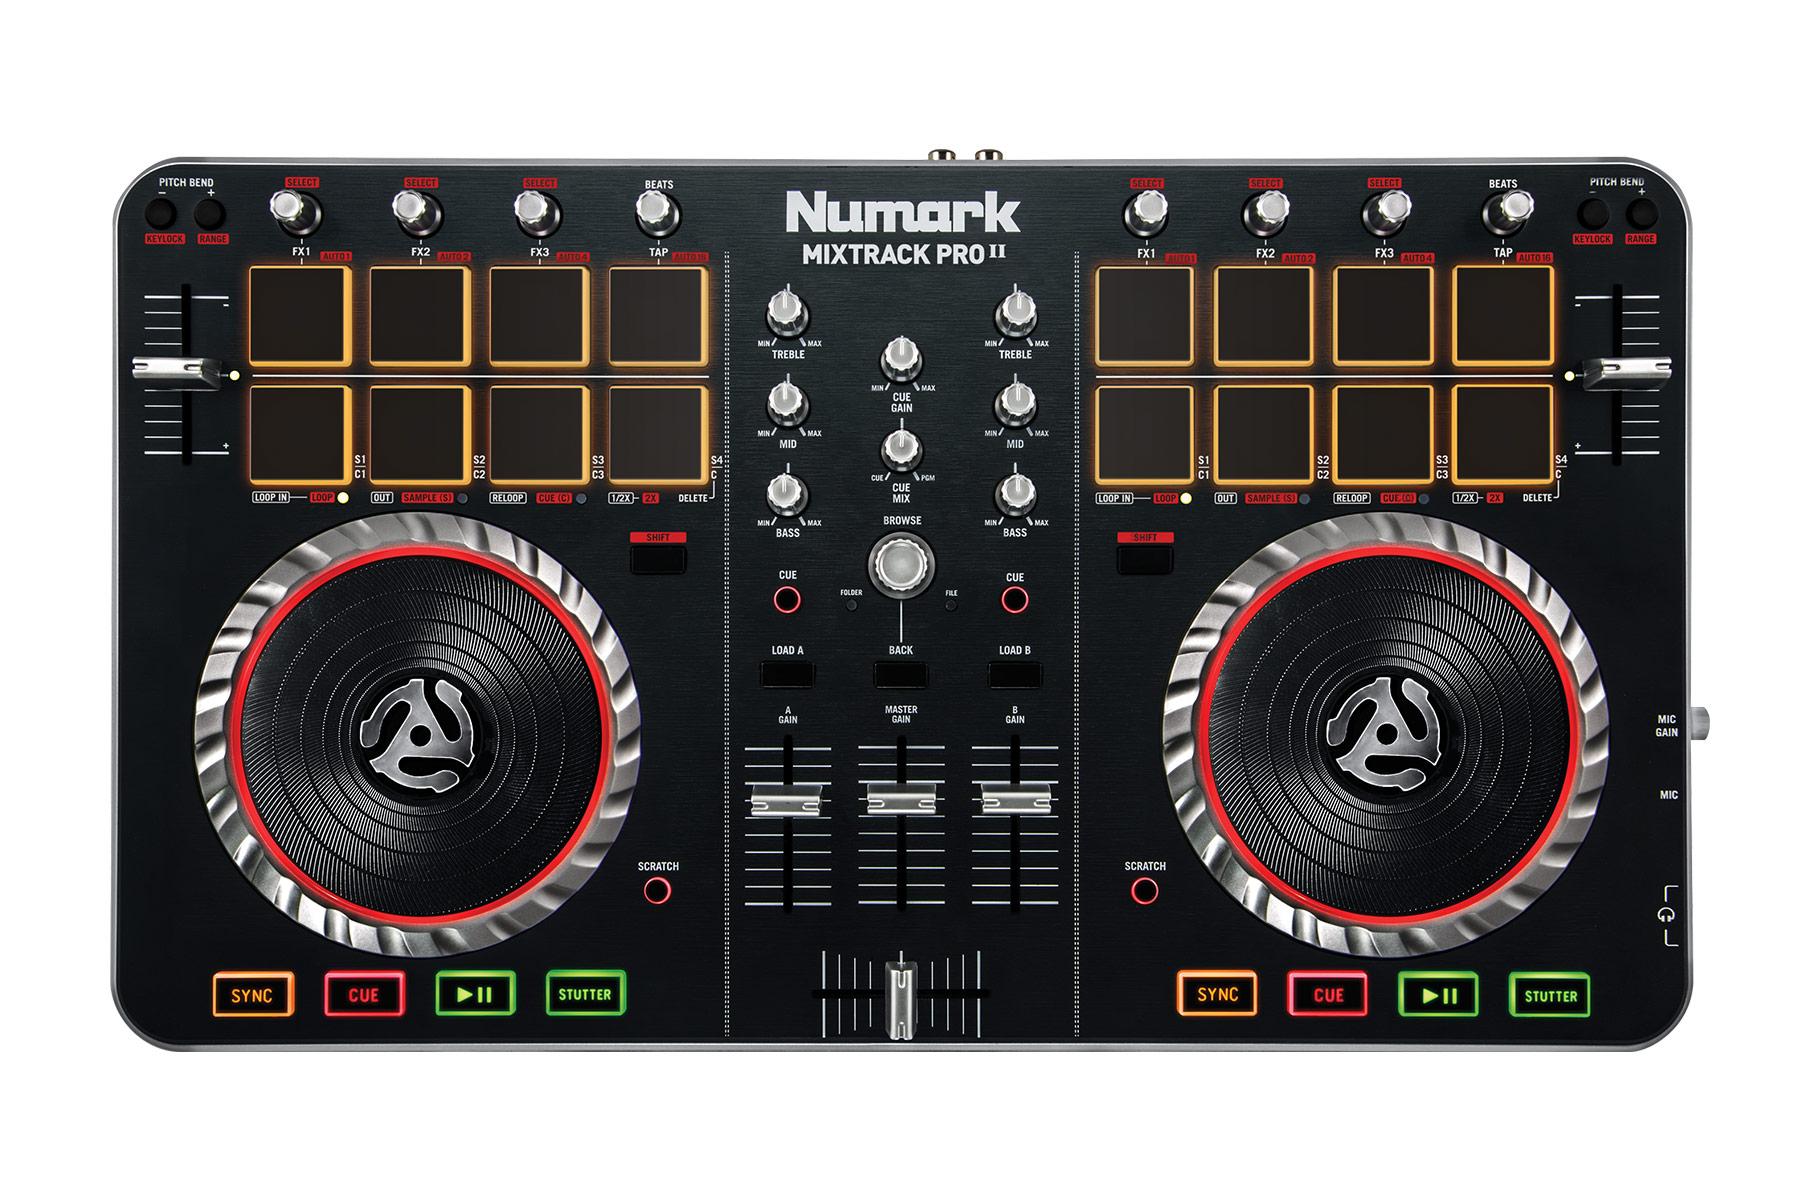 Numark Mixtrack Pro Ii Serato Dj Dj Hardware Learn